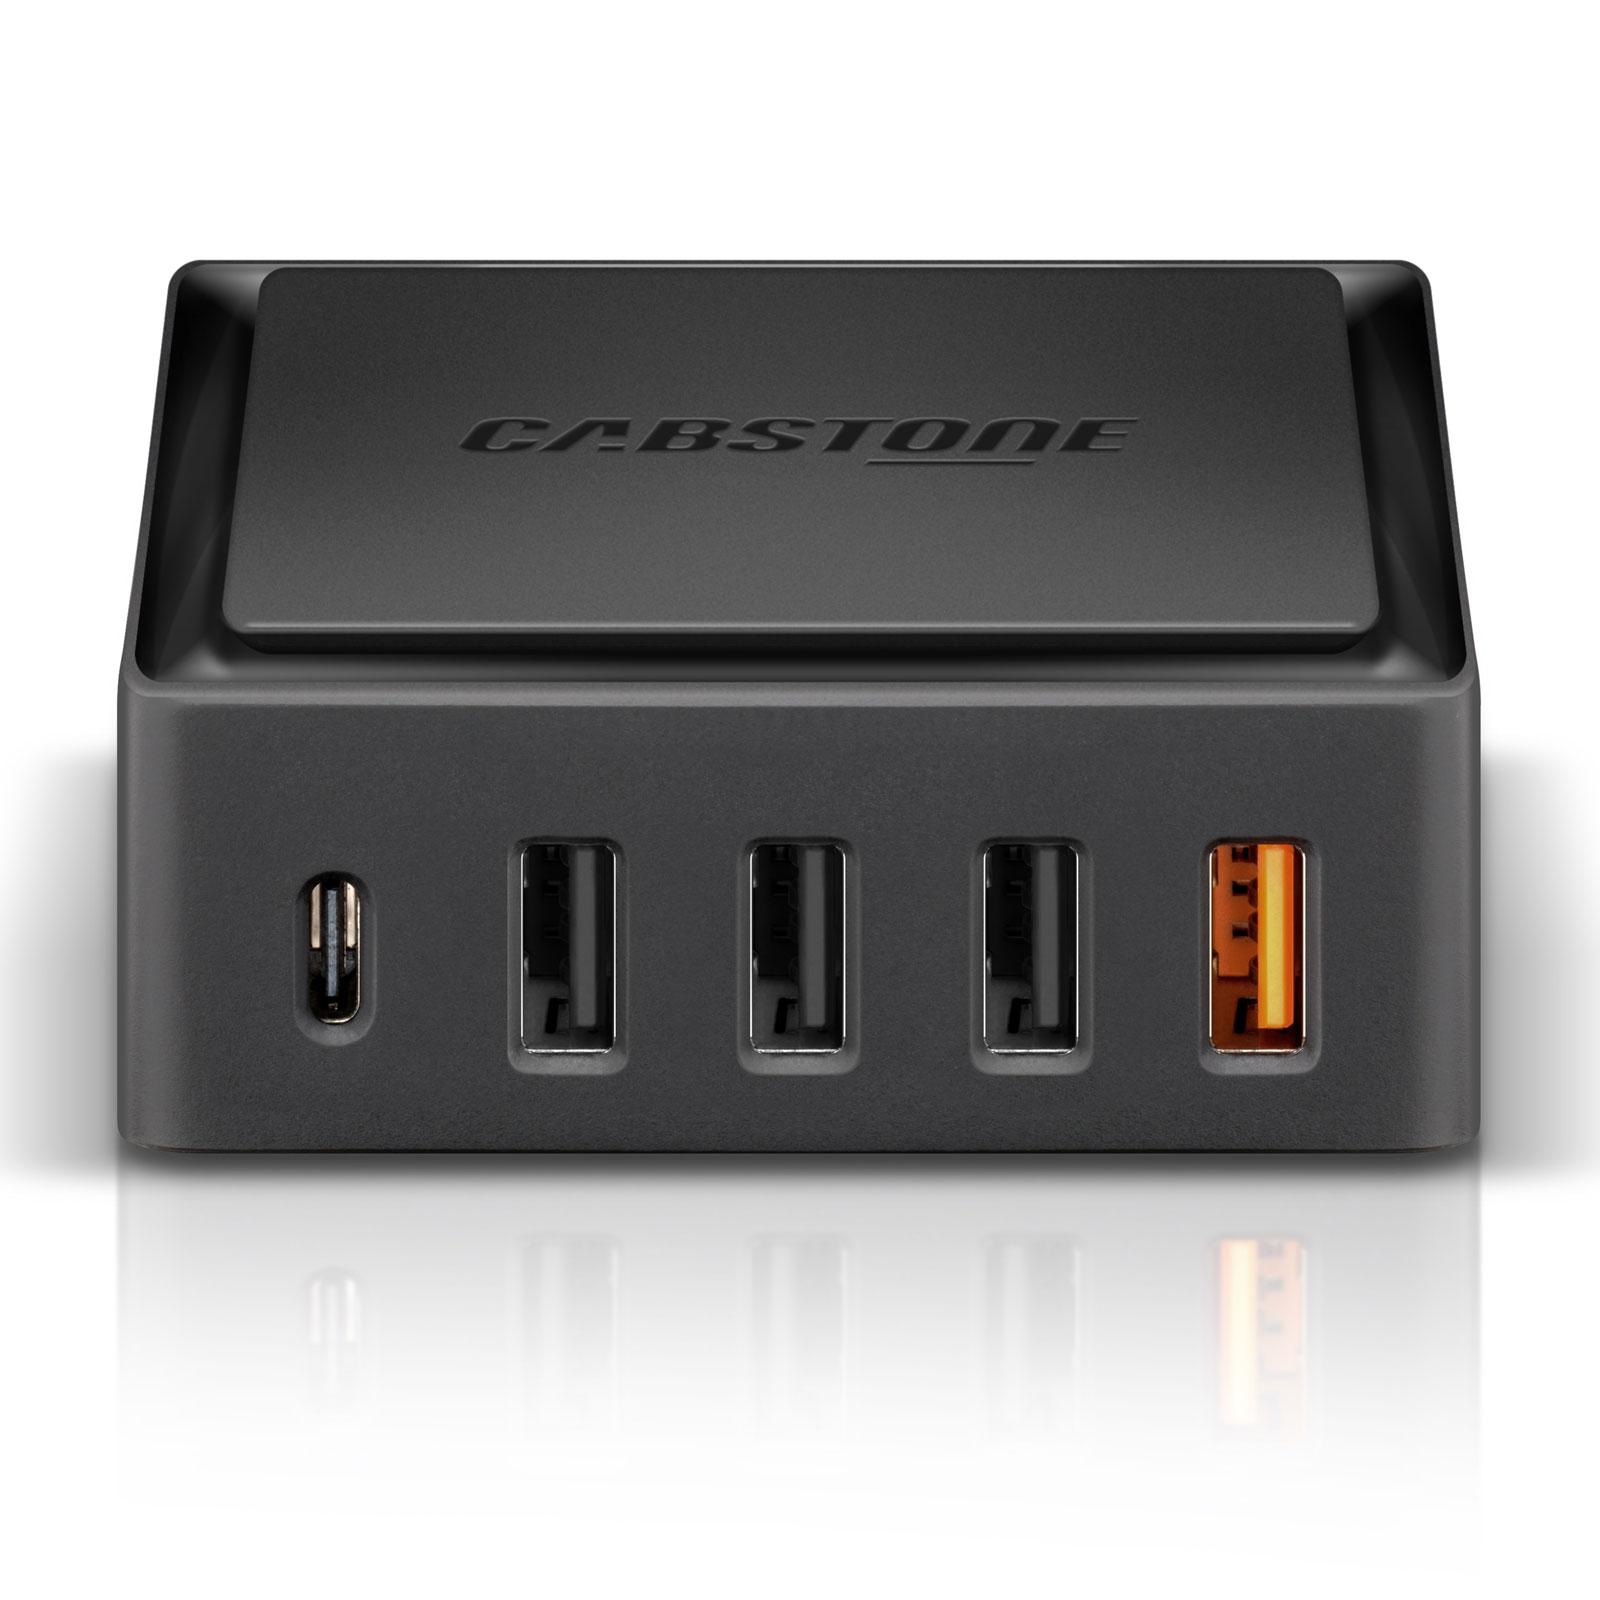 cabstone quick charge 5 ports desktop charger usb cabstone sur. Black Bedroom Furniture Sets. Home Design Ideas